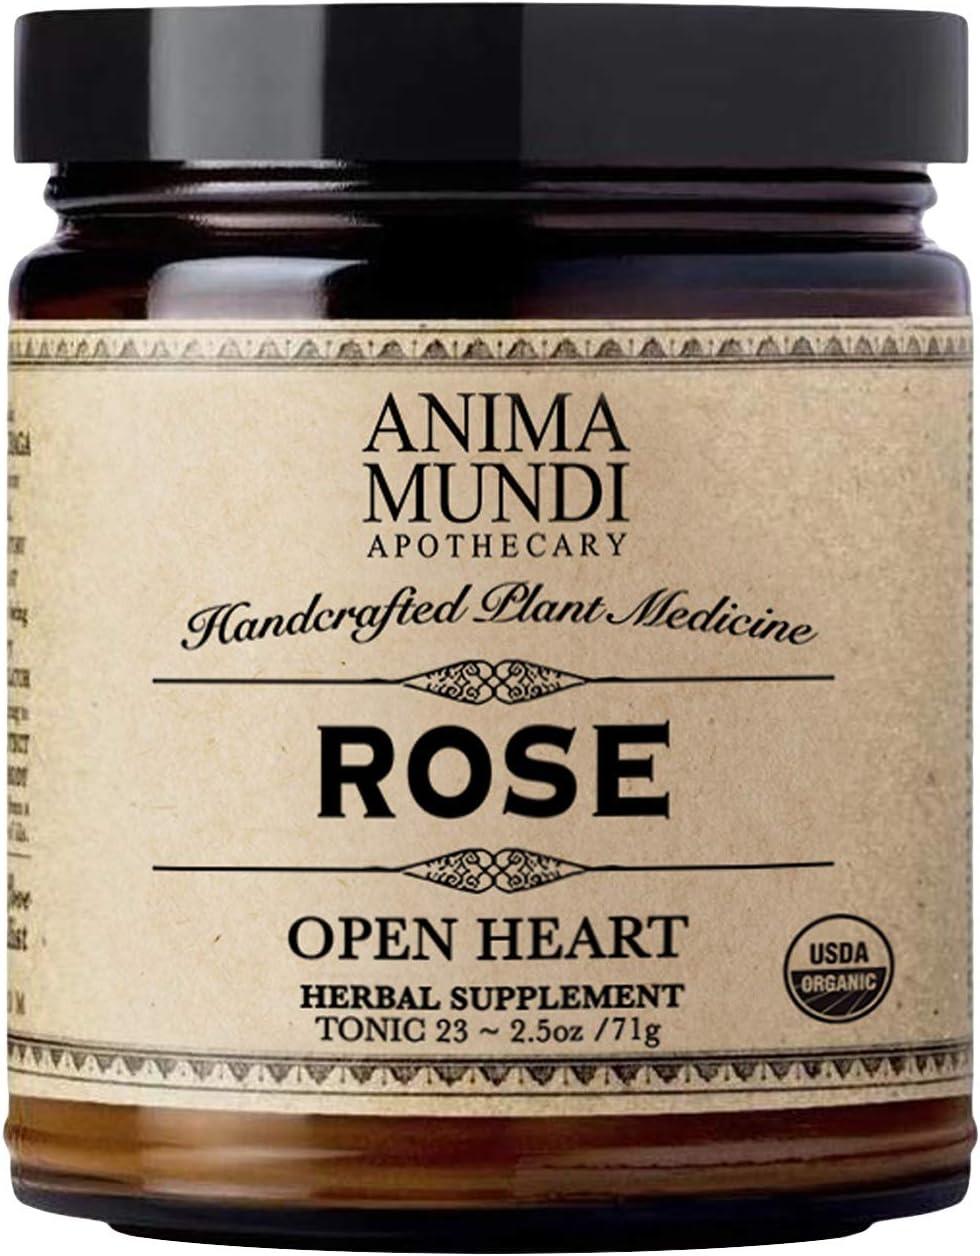 Anima Mundi Rose Petal Powder - 100% Organic Rose Powder for Teas, Lattes, Smoothies & More - Natural Formula to Support Positive Mood (2.5oz / 71g)